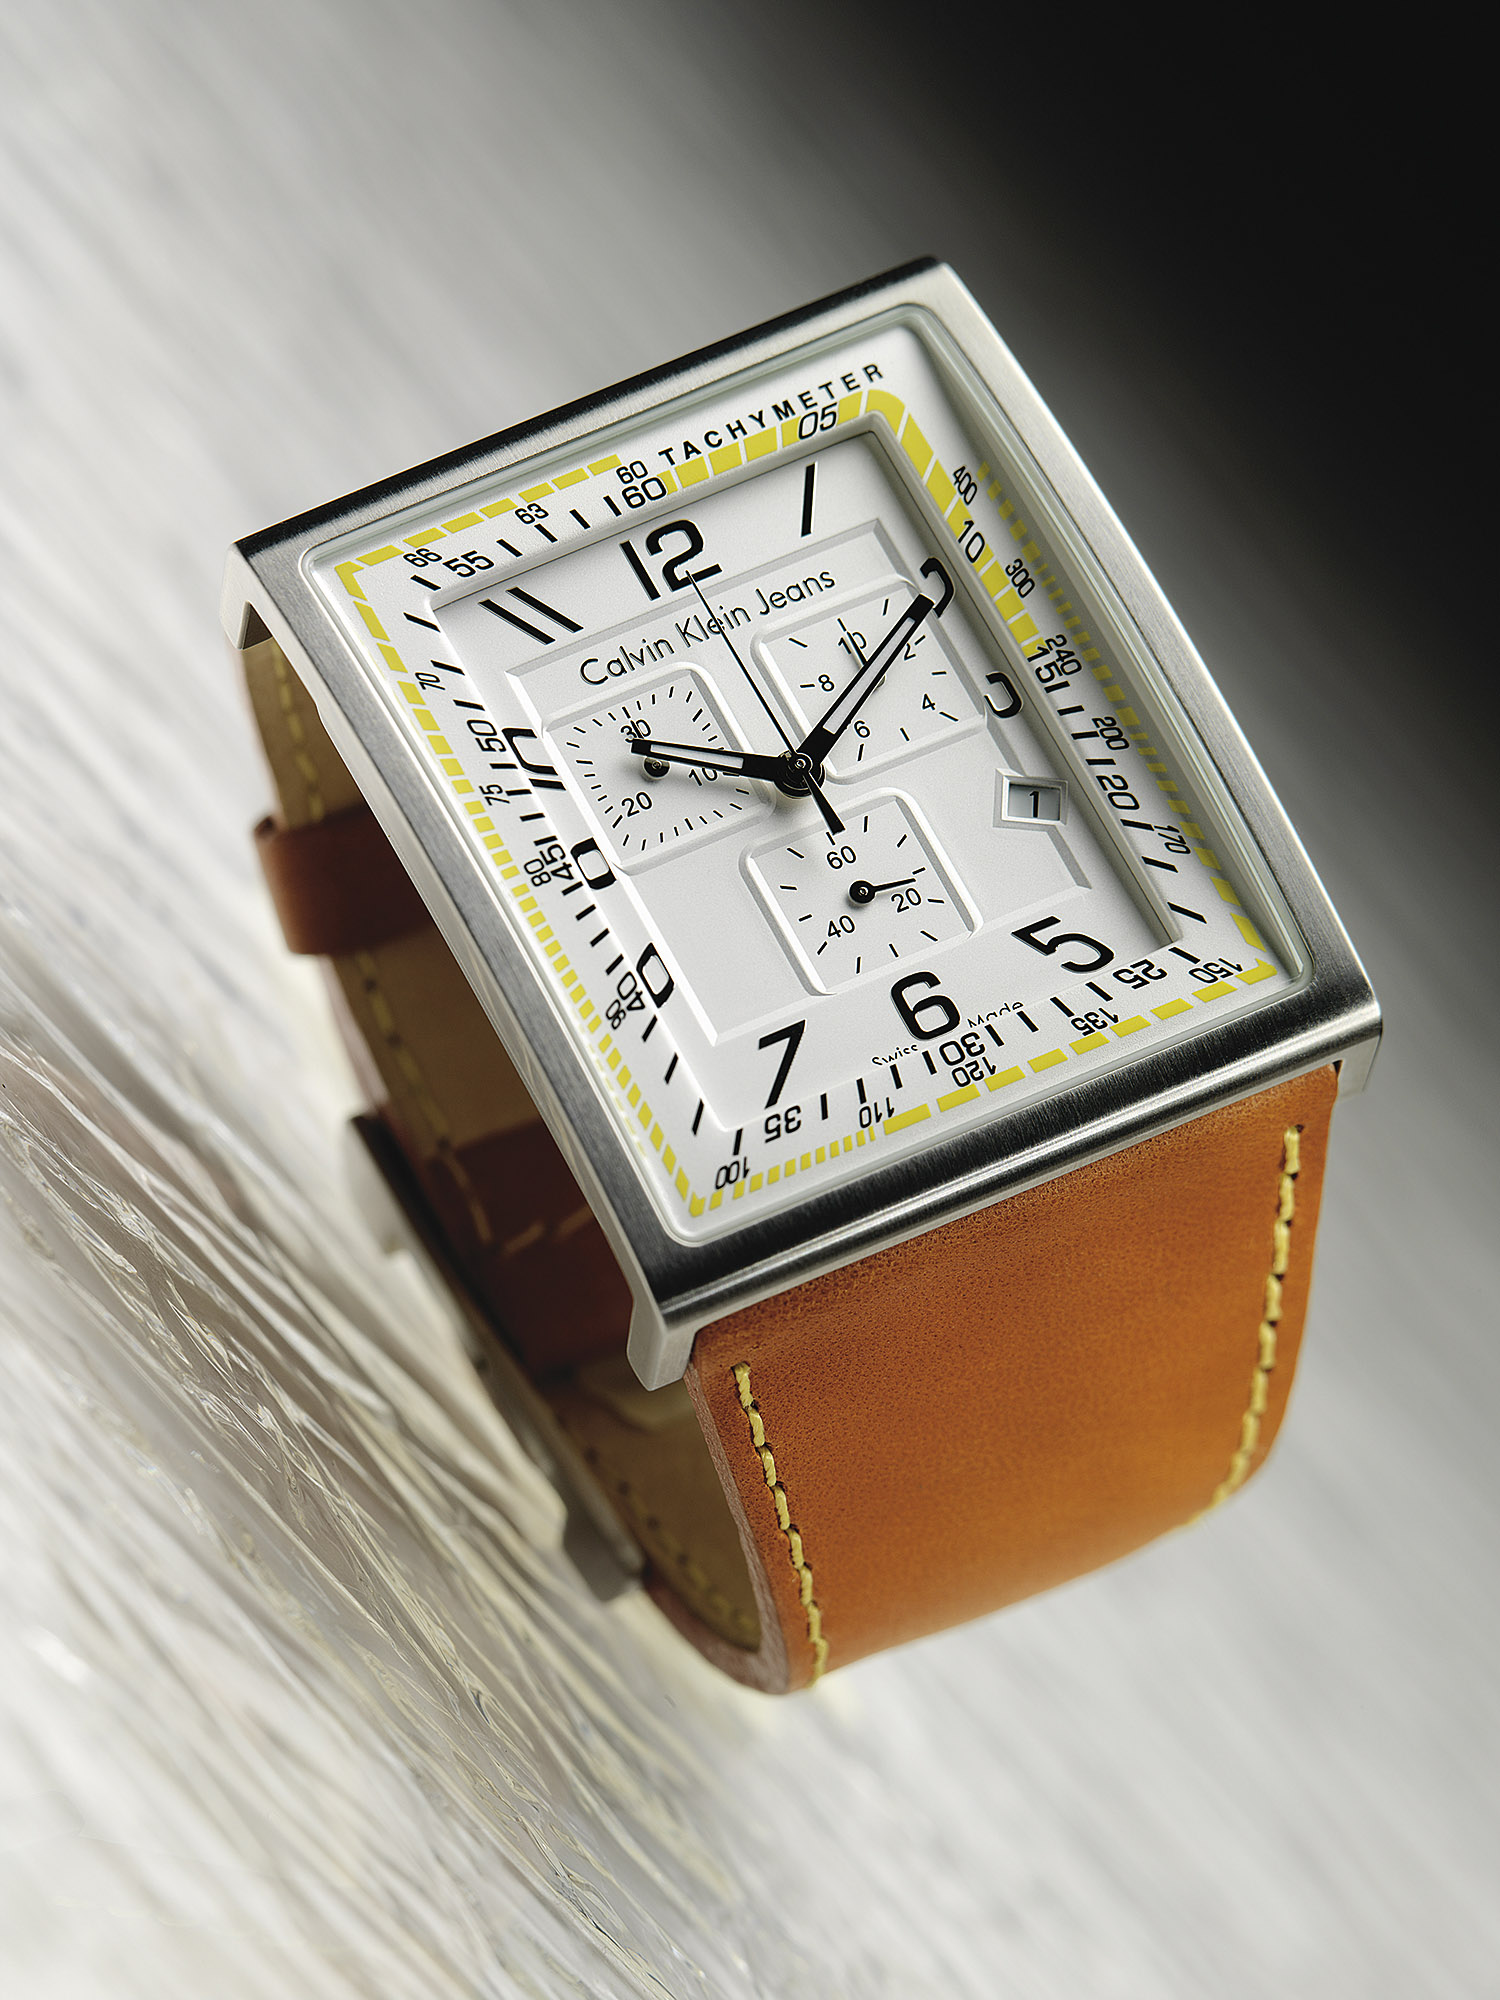 vajenti foto oreficeria orologi vicenza 297